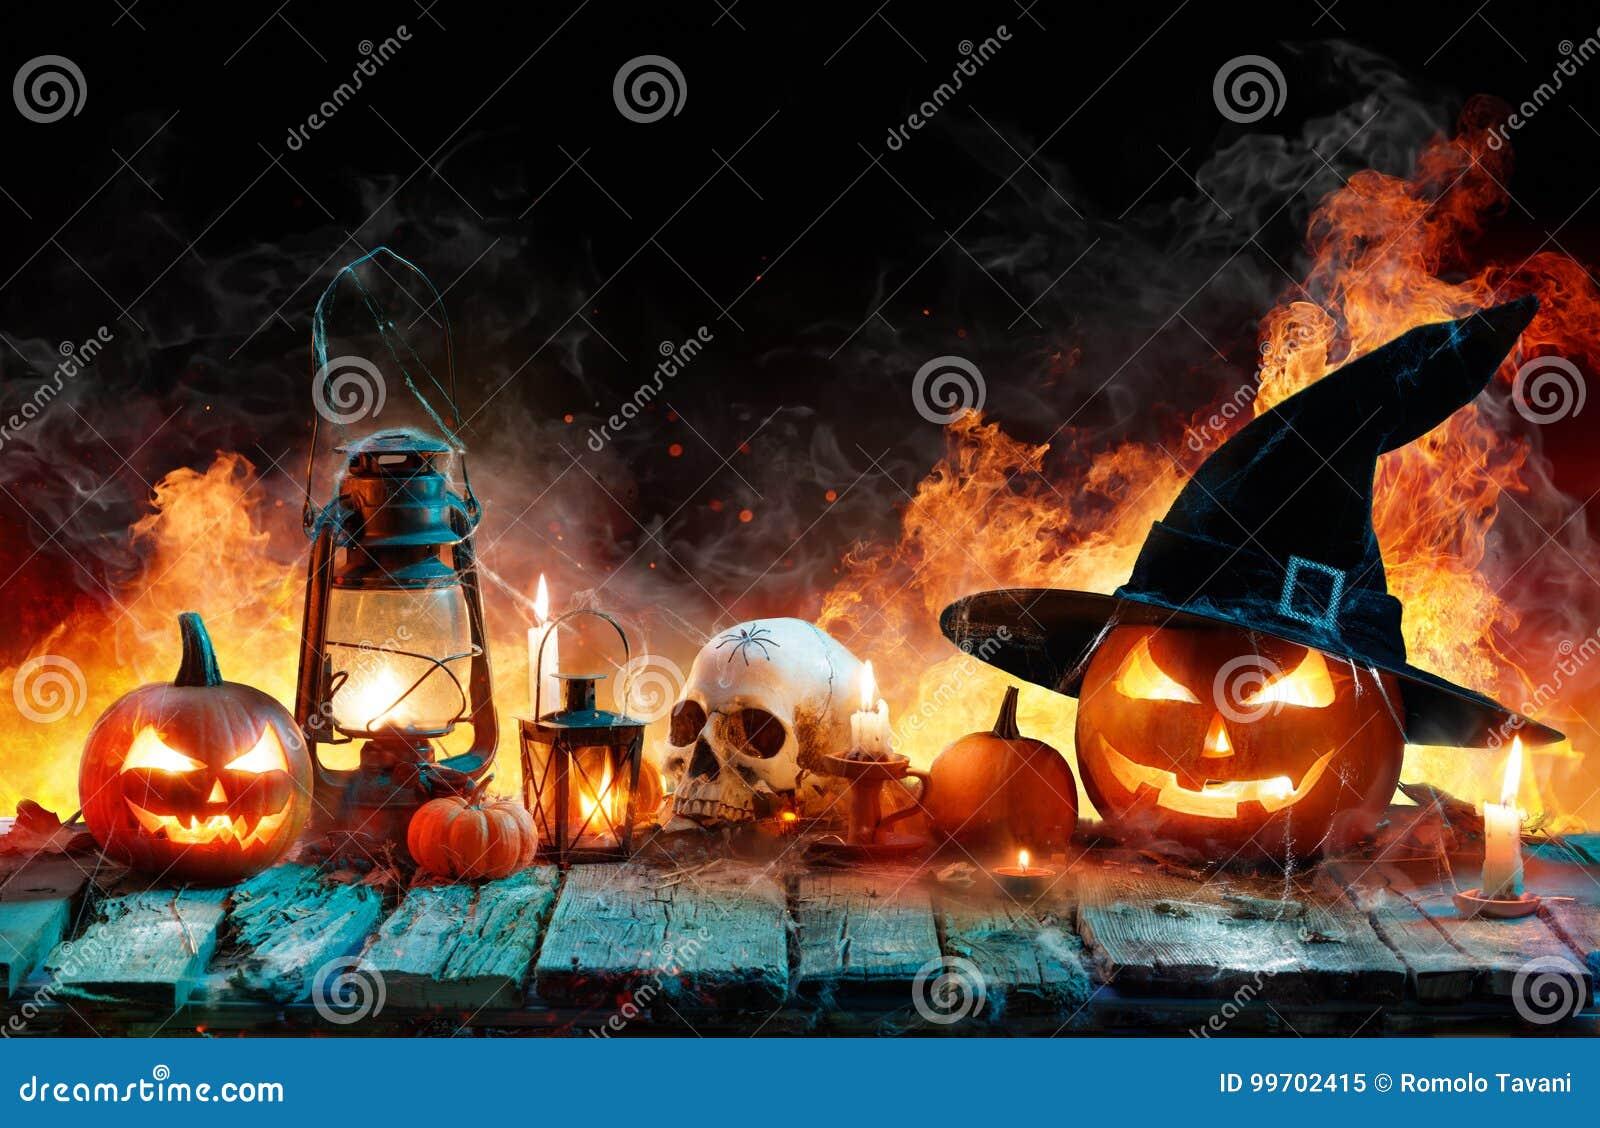 Halloween In Flame - Burning Pumpkins